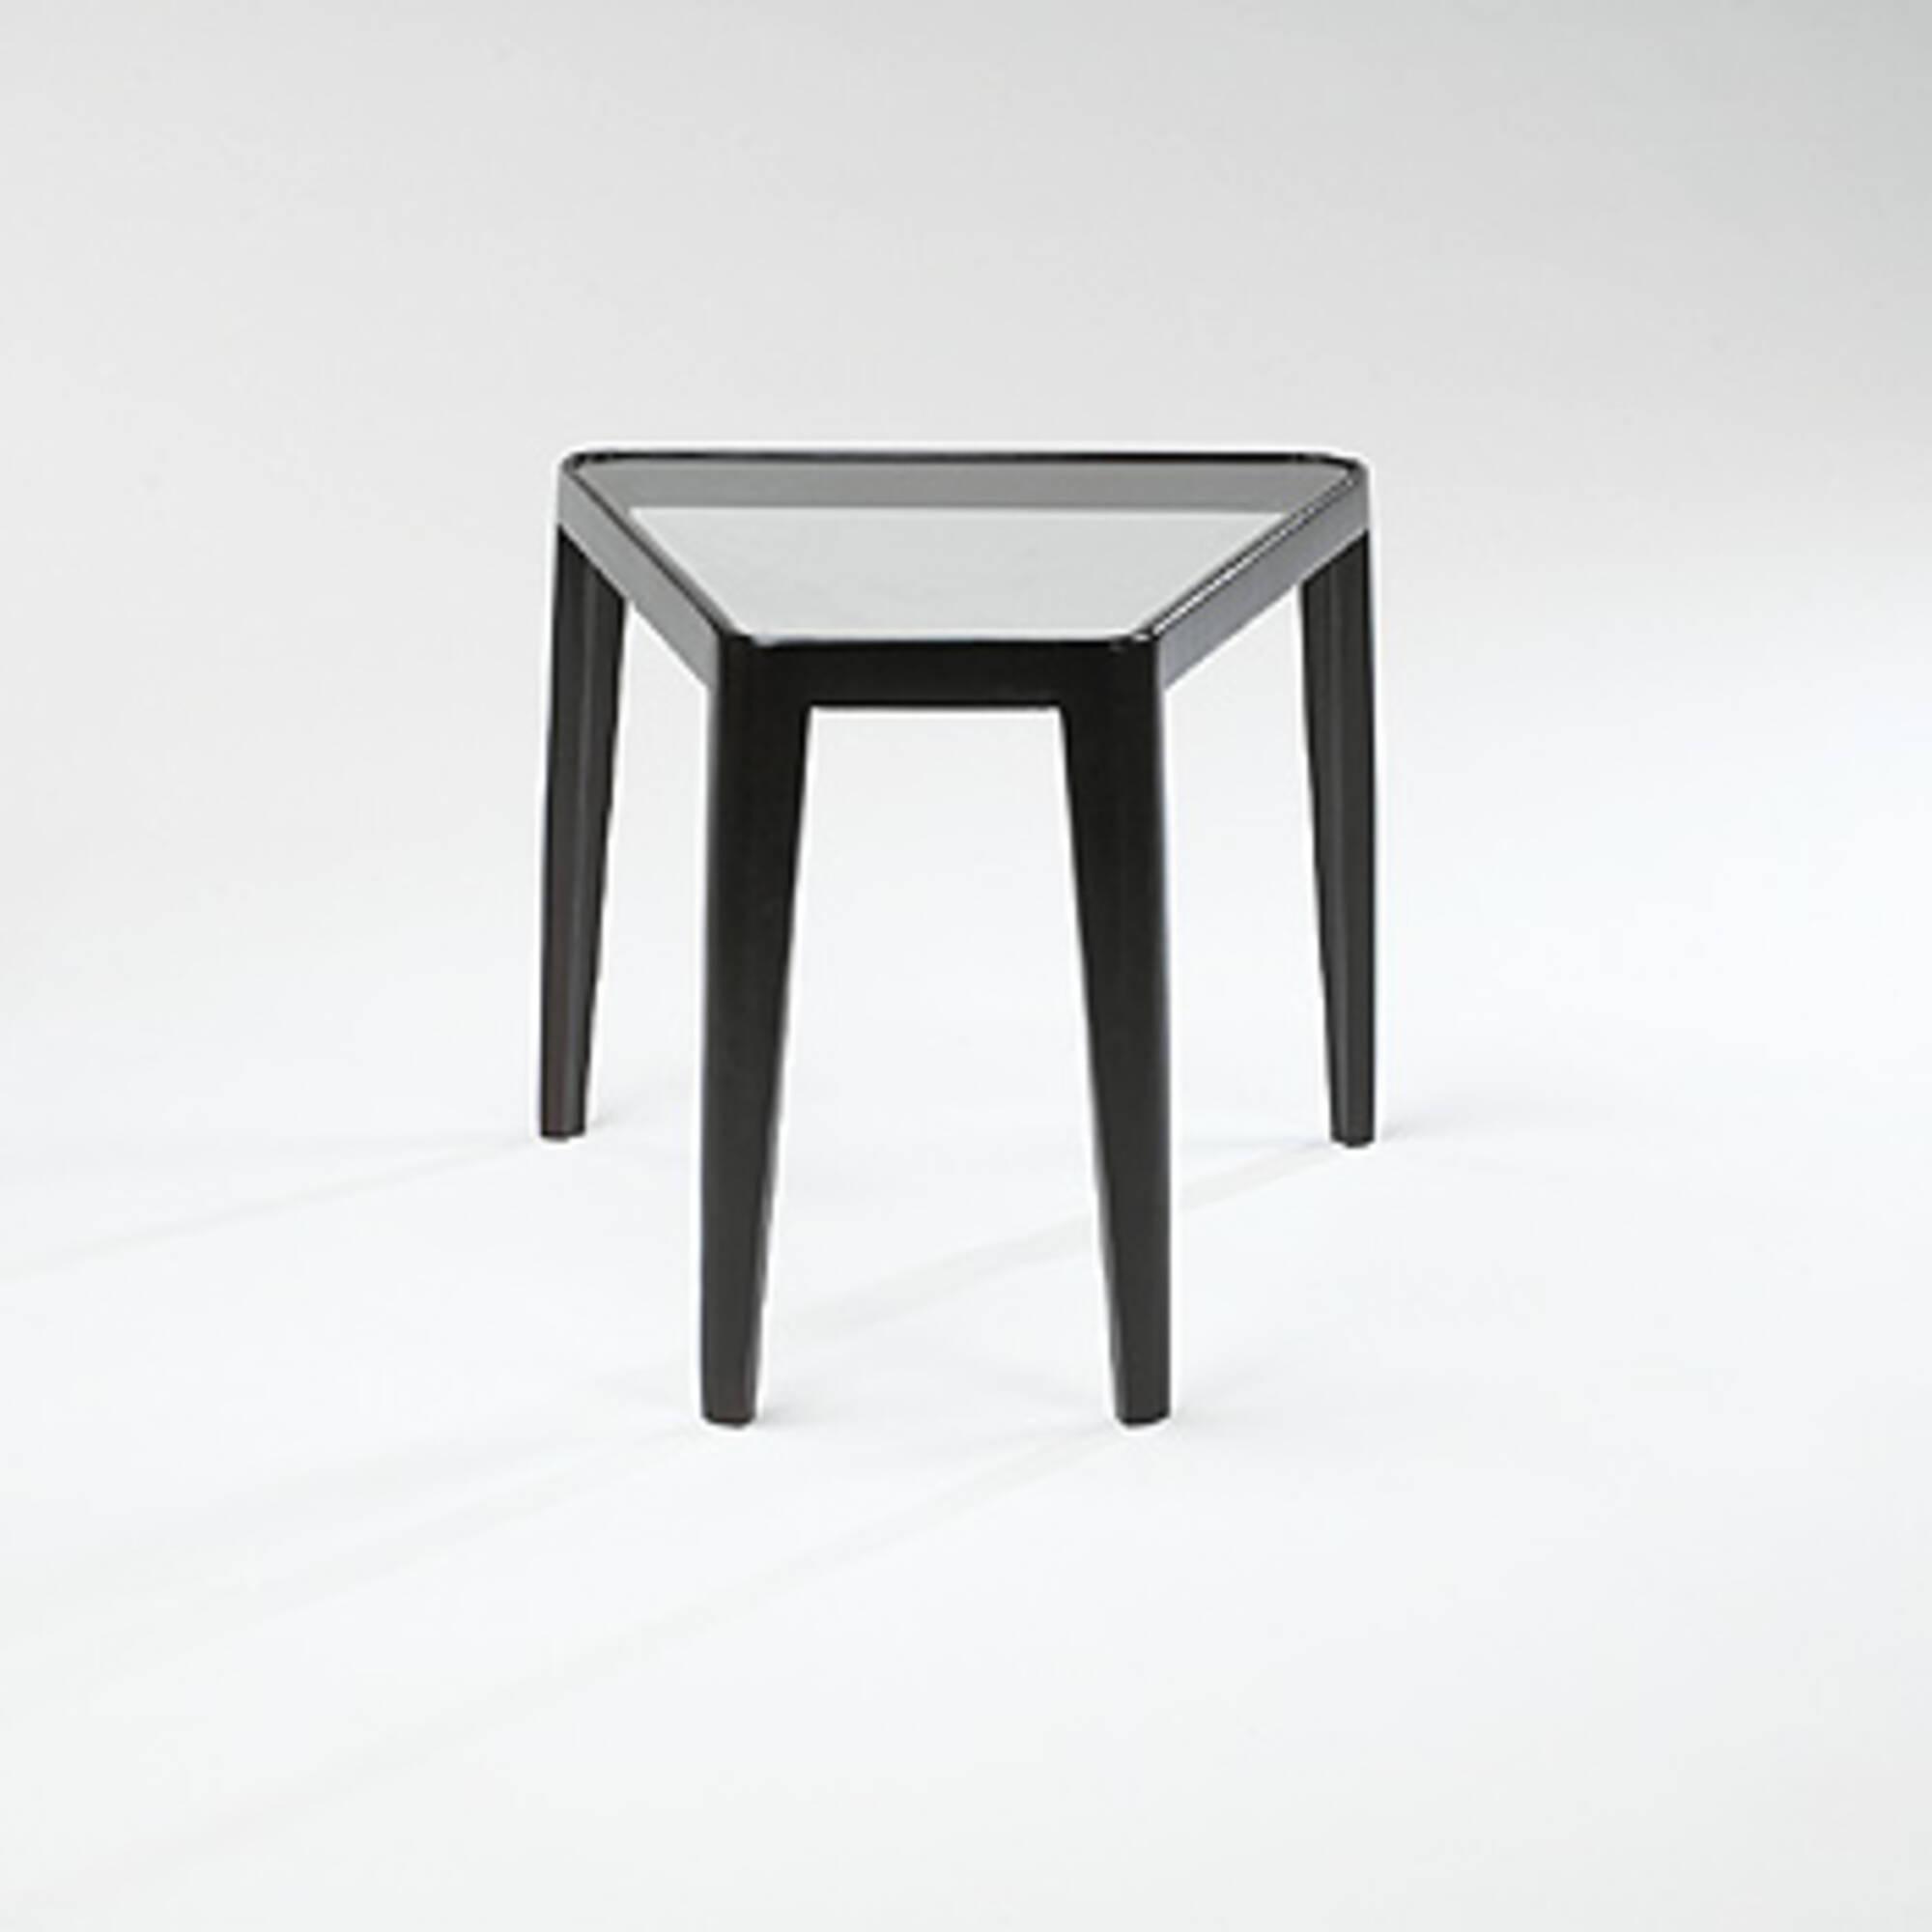 236 Edward Wormley Wedge Shaped End Table Modern Design 16